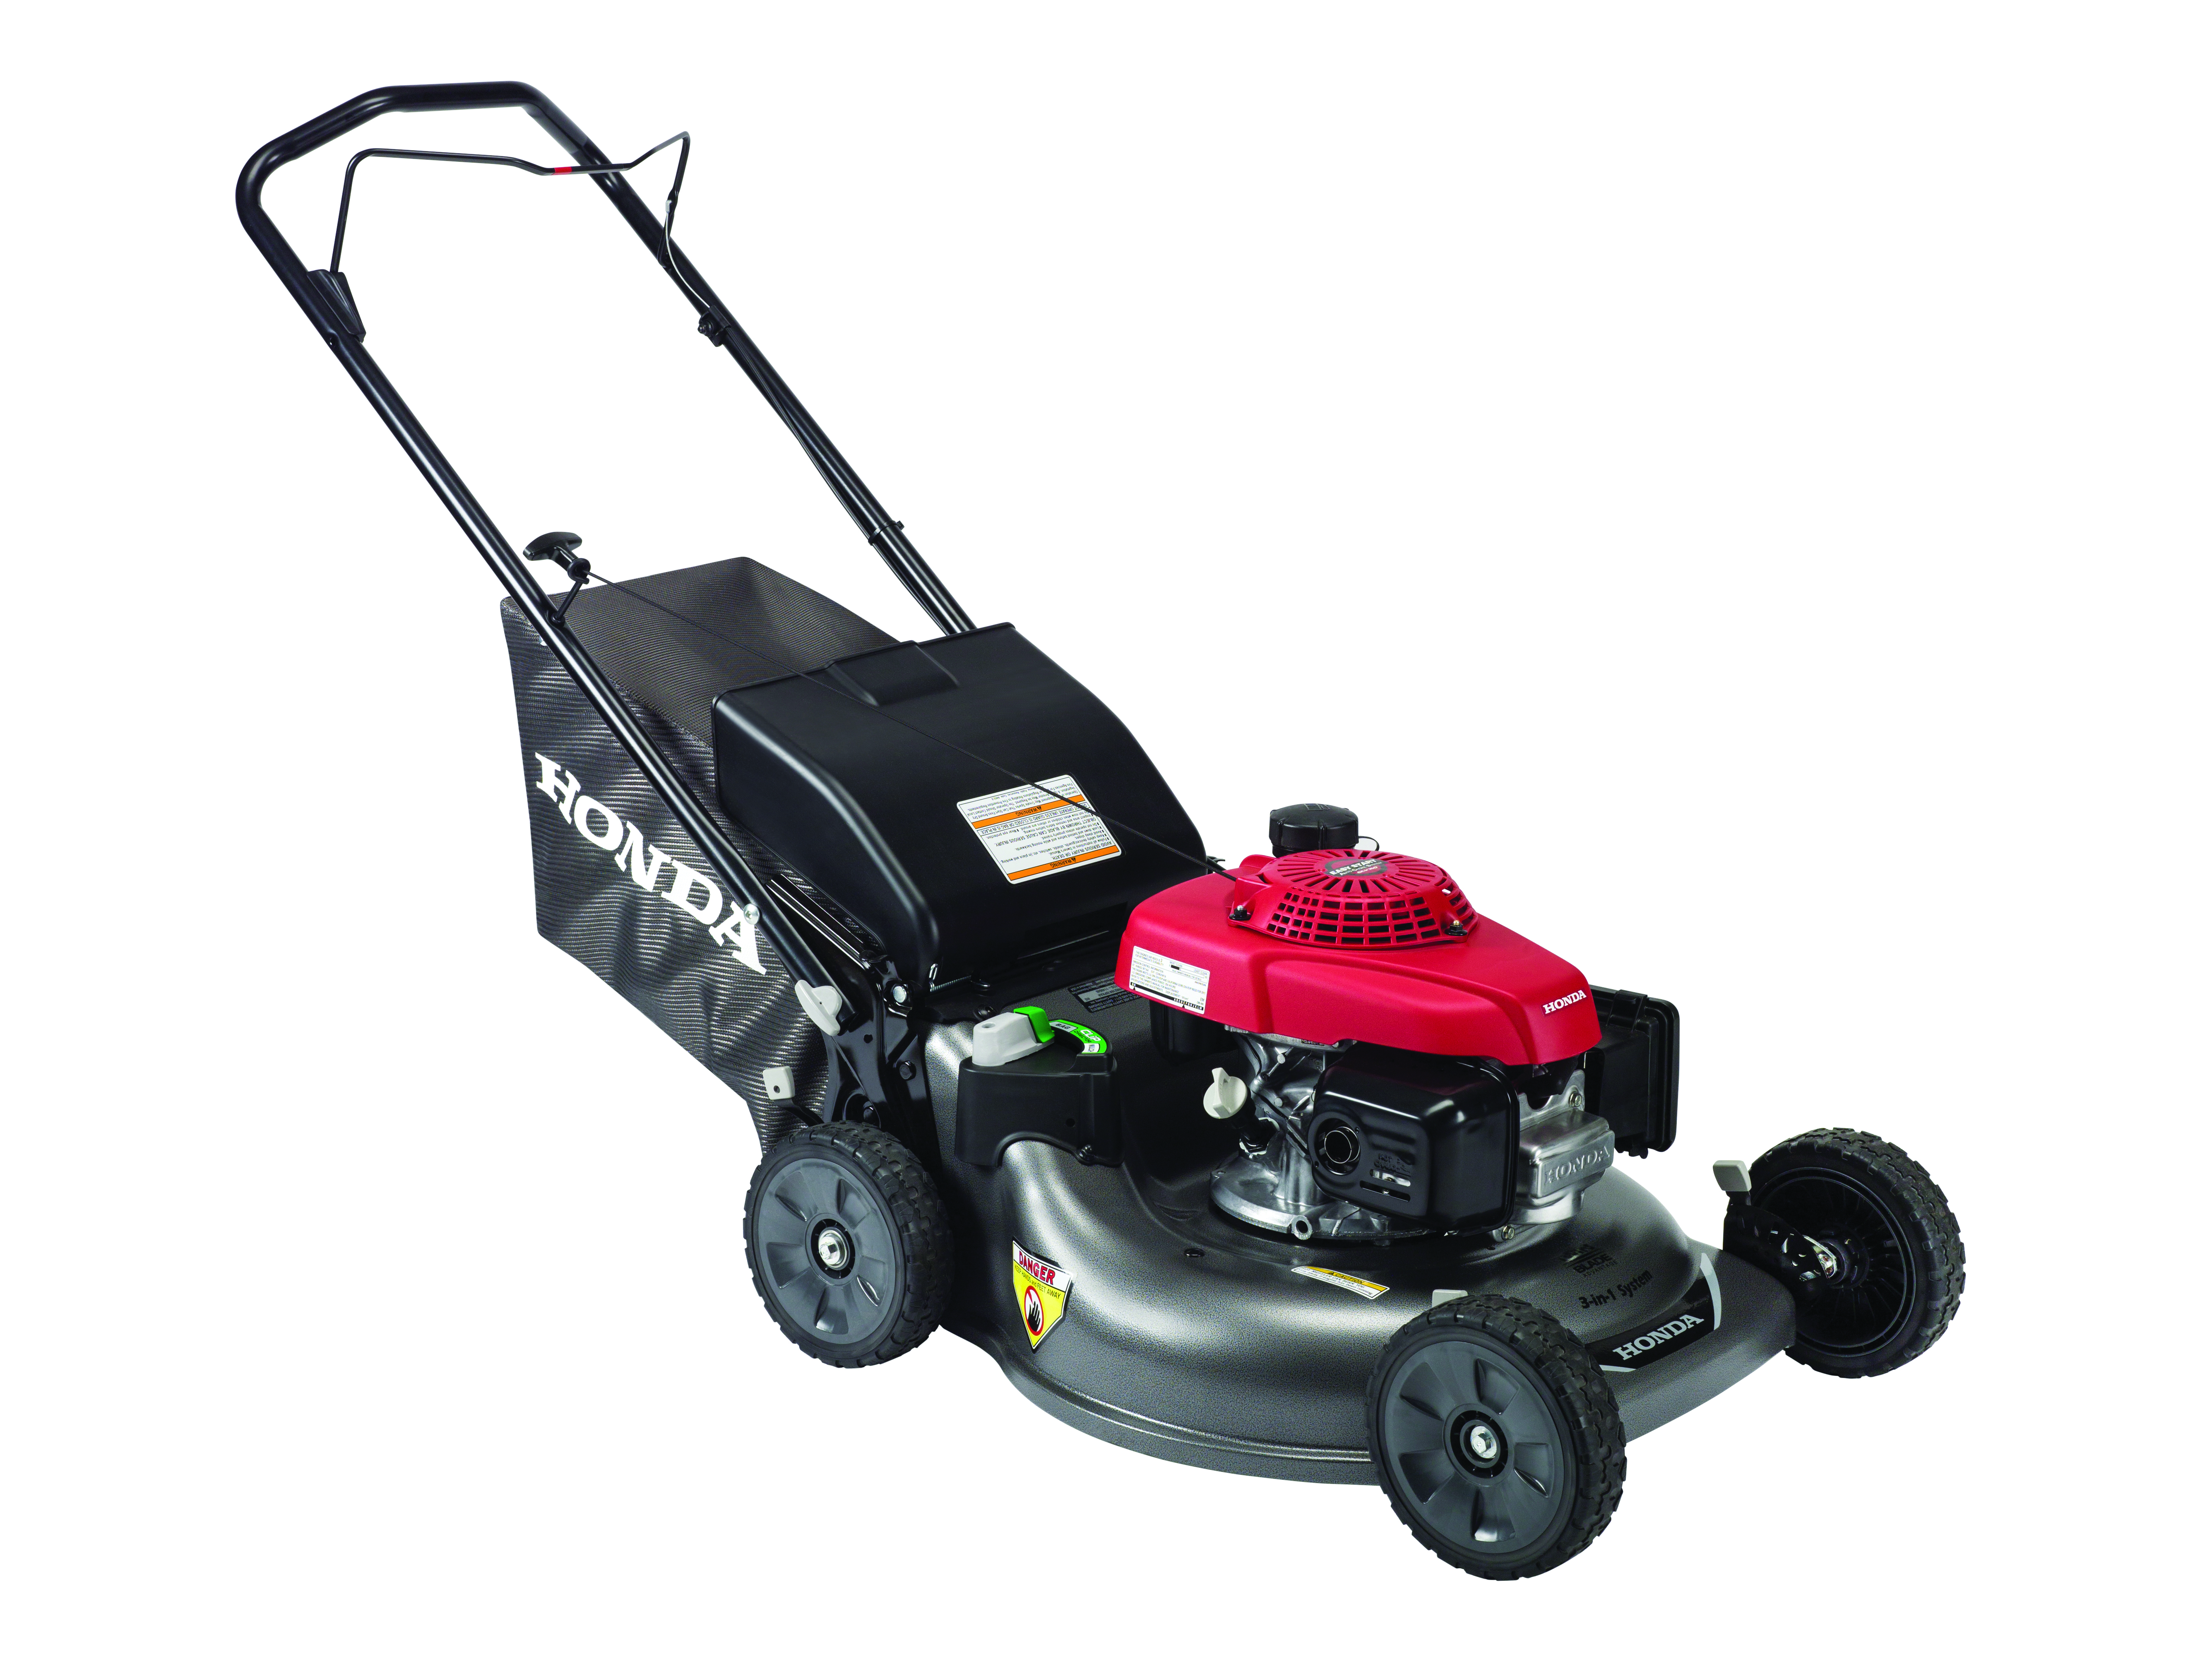 Honda HRR Lawn Mower Parts